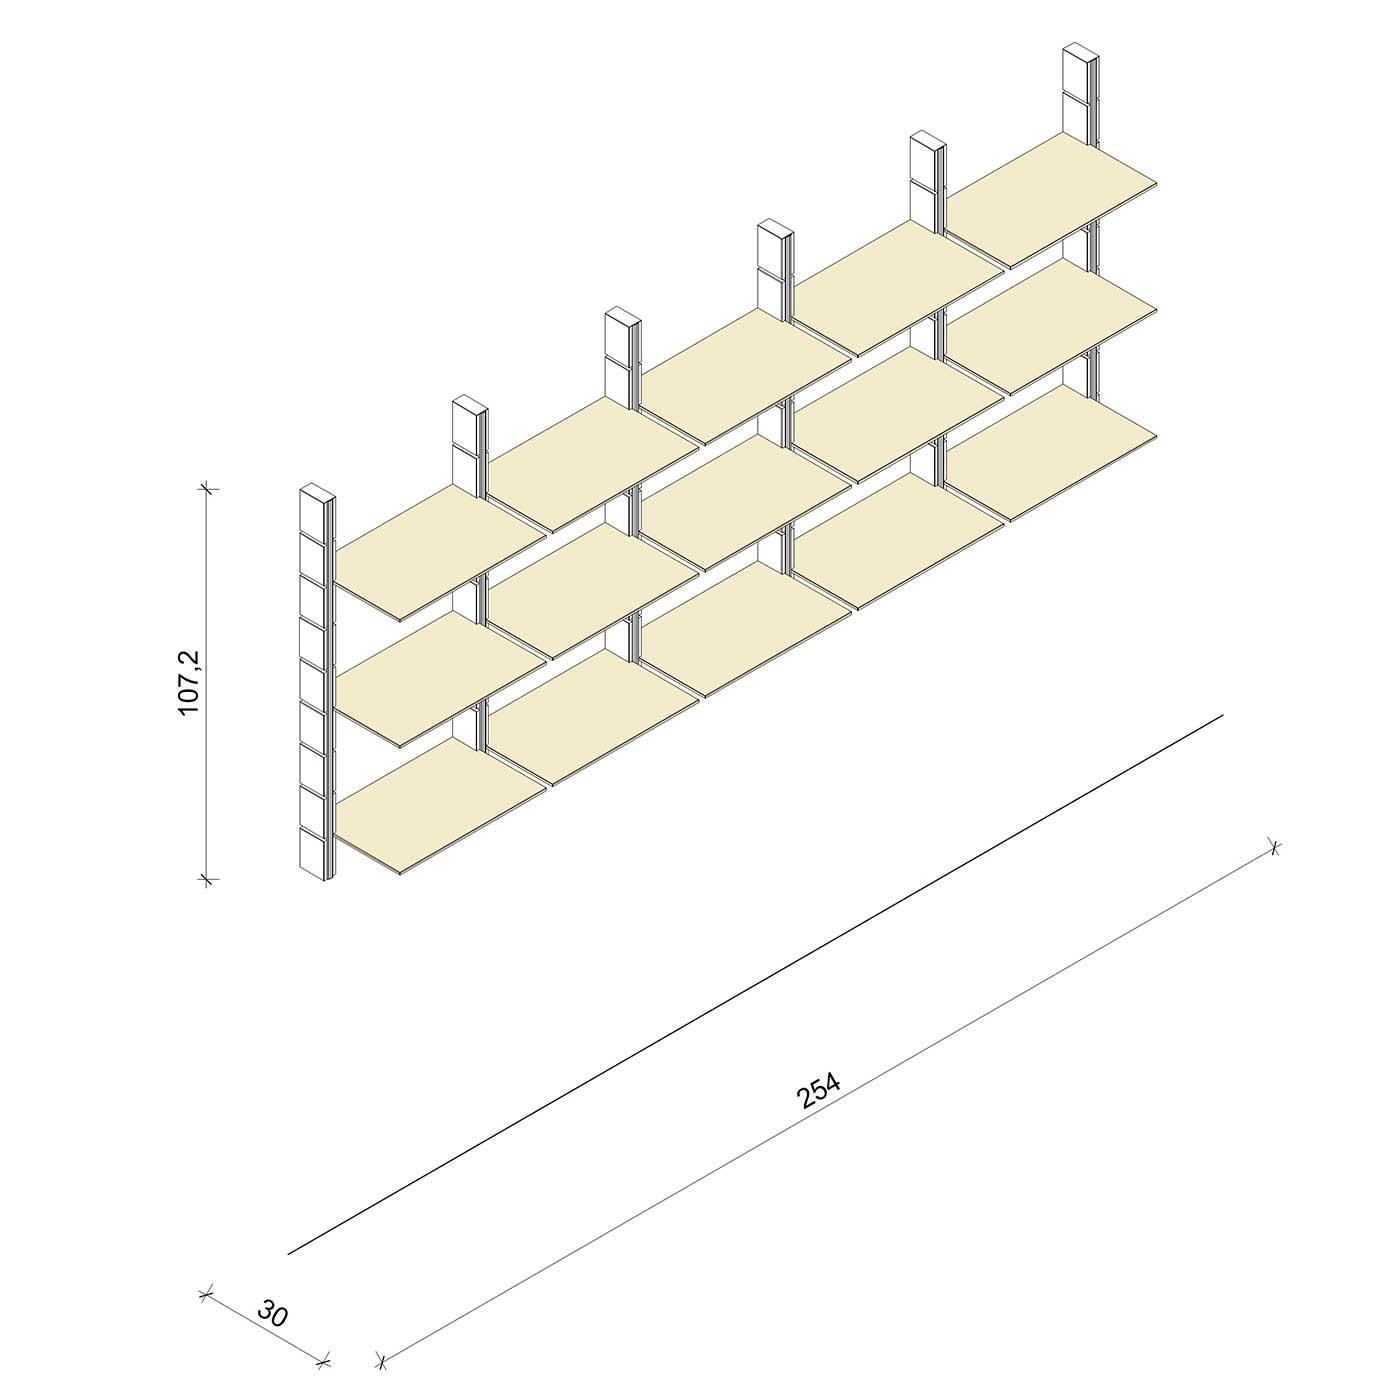 Bücherregal - Comfort (M) 254 - Maß: 254 x 107,2 x 30 cm (B x H x T)